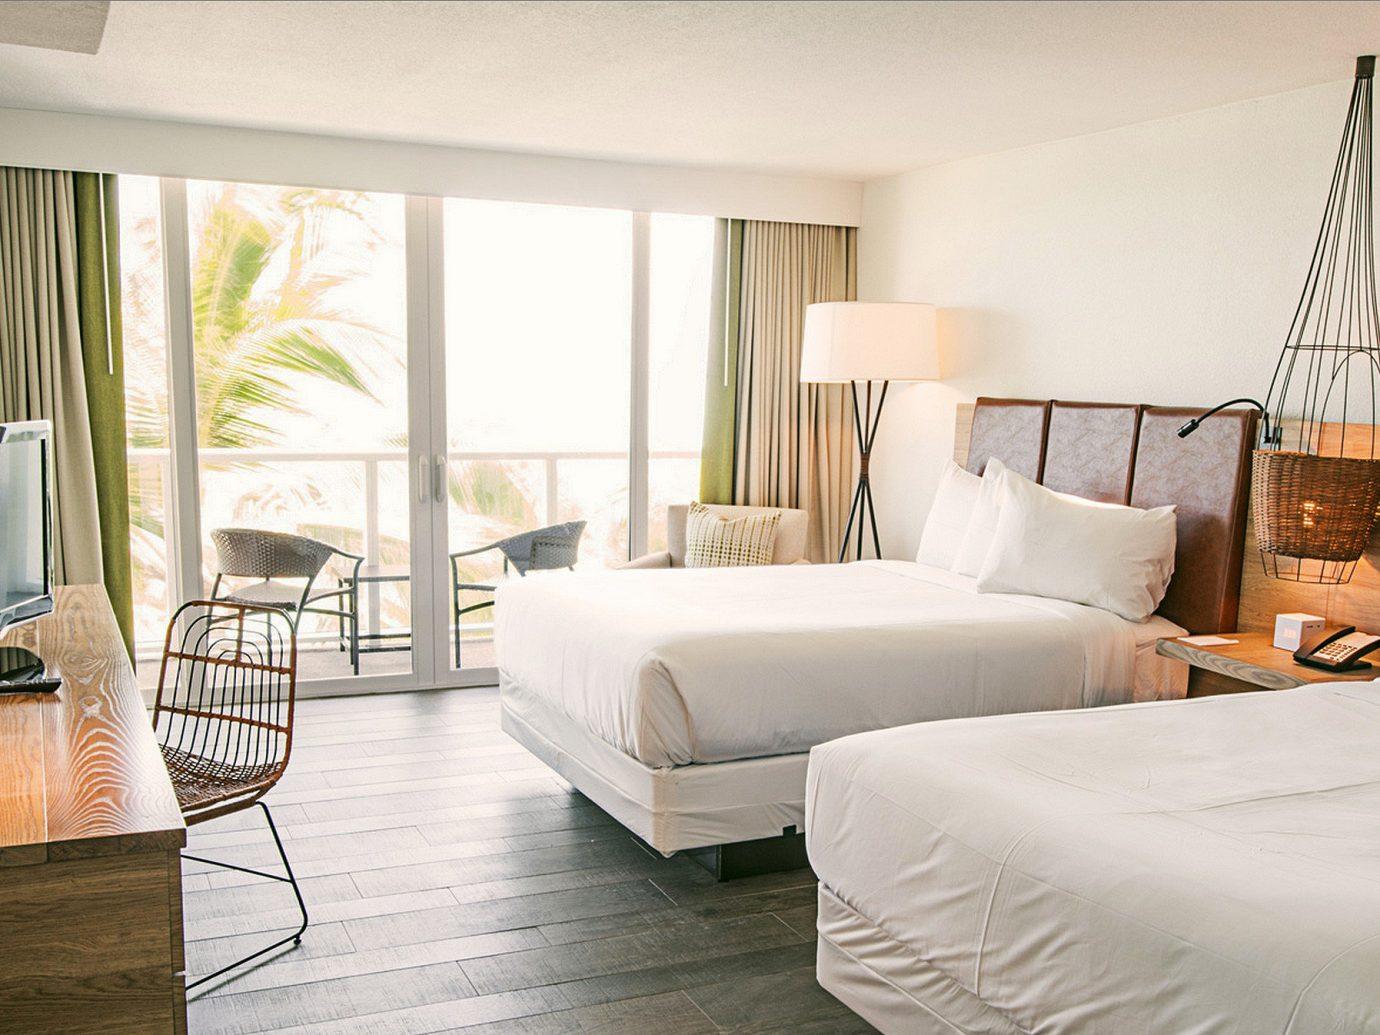 Beach Beachfront Bedroom Hotels Resort indoor bed floor wall room hotel property living room home Suite interior design estate condominium real estate furniture cottage apartment Villa